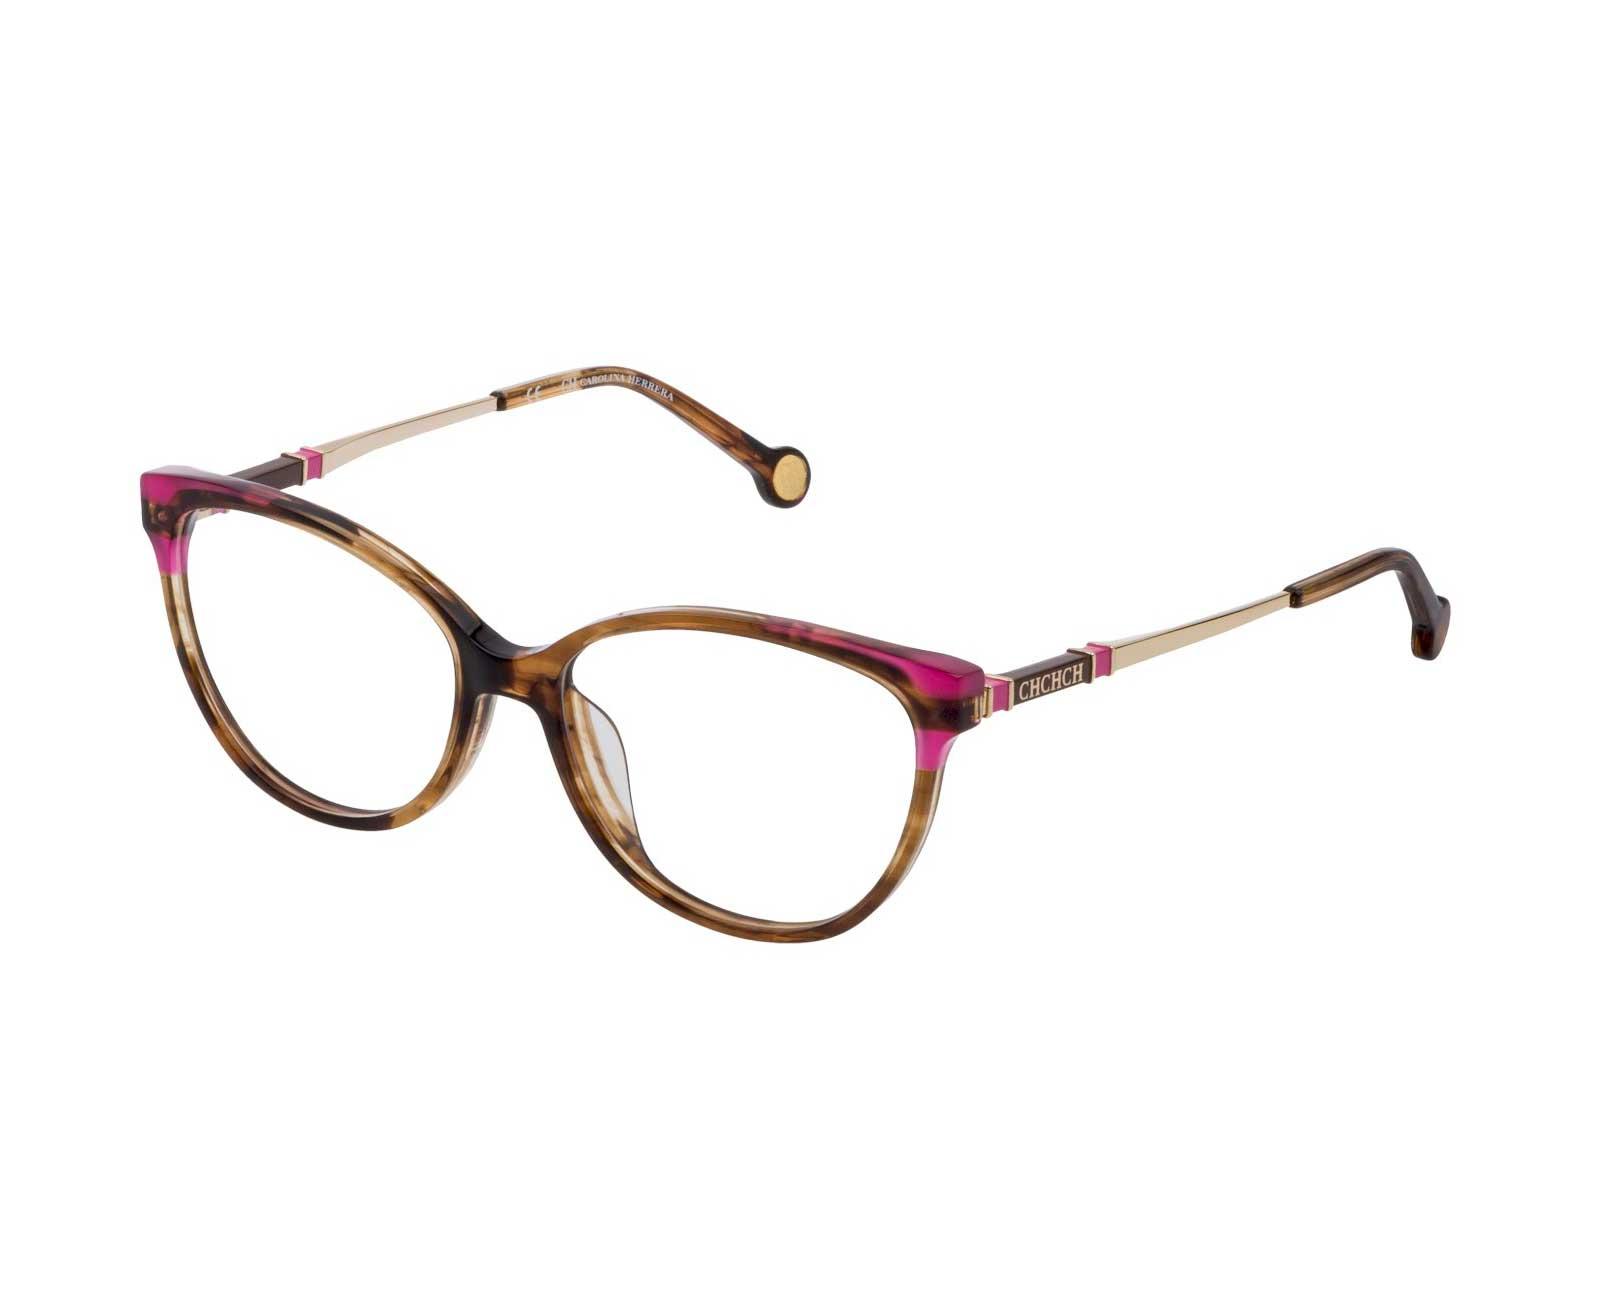 Carolina-Herrera-VHE851-in-Striped-Pink-Brown-Mustard